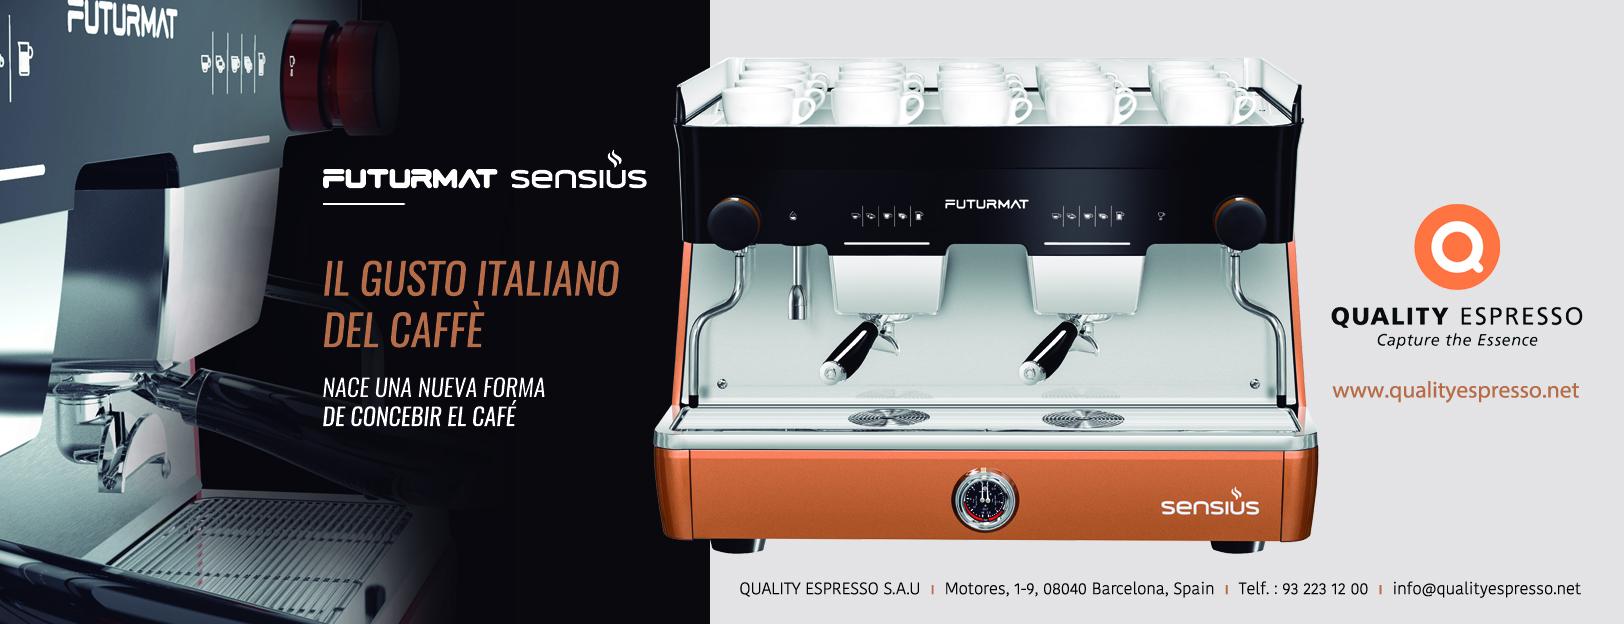 quality-espresso-anunci-1640x624-AAFF.jpg